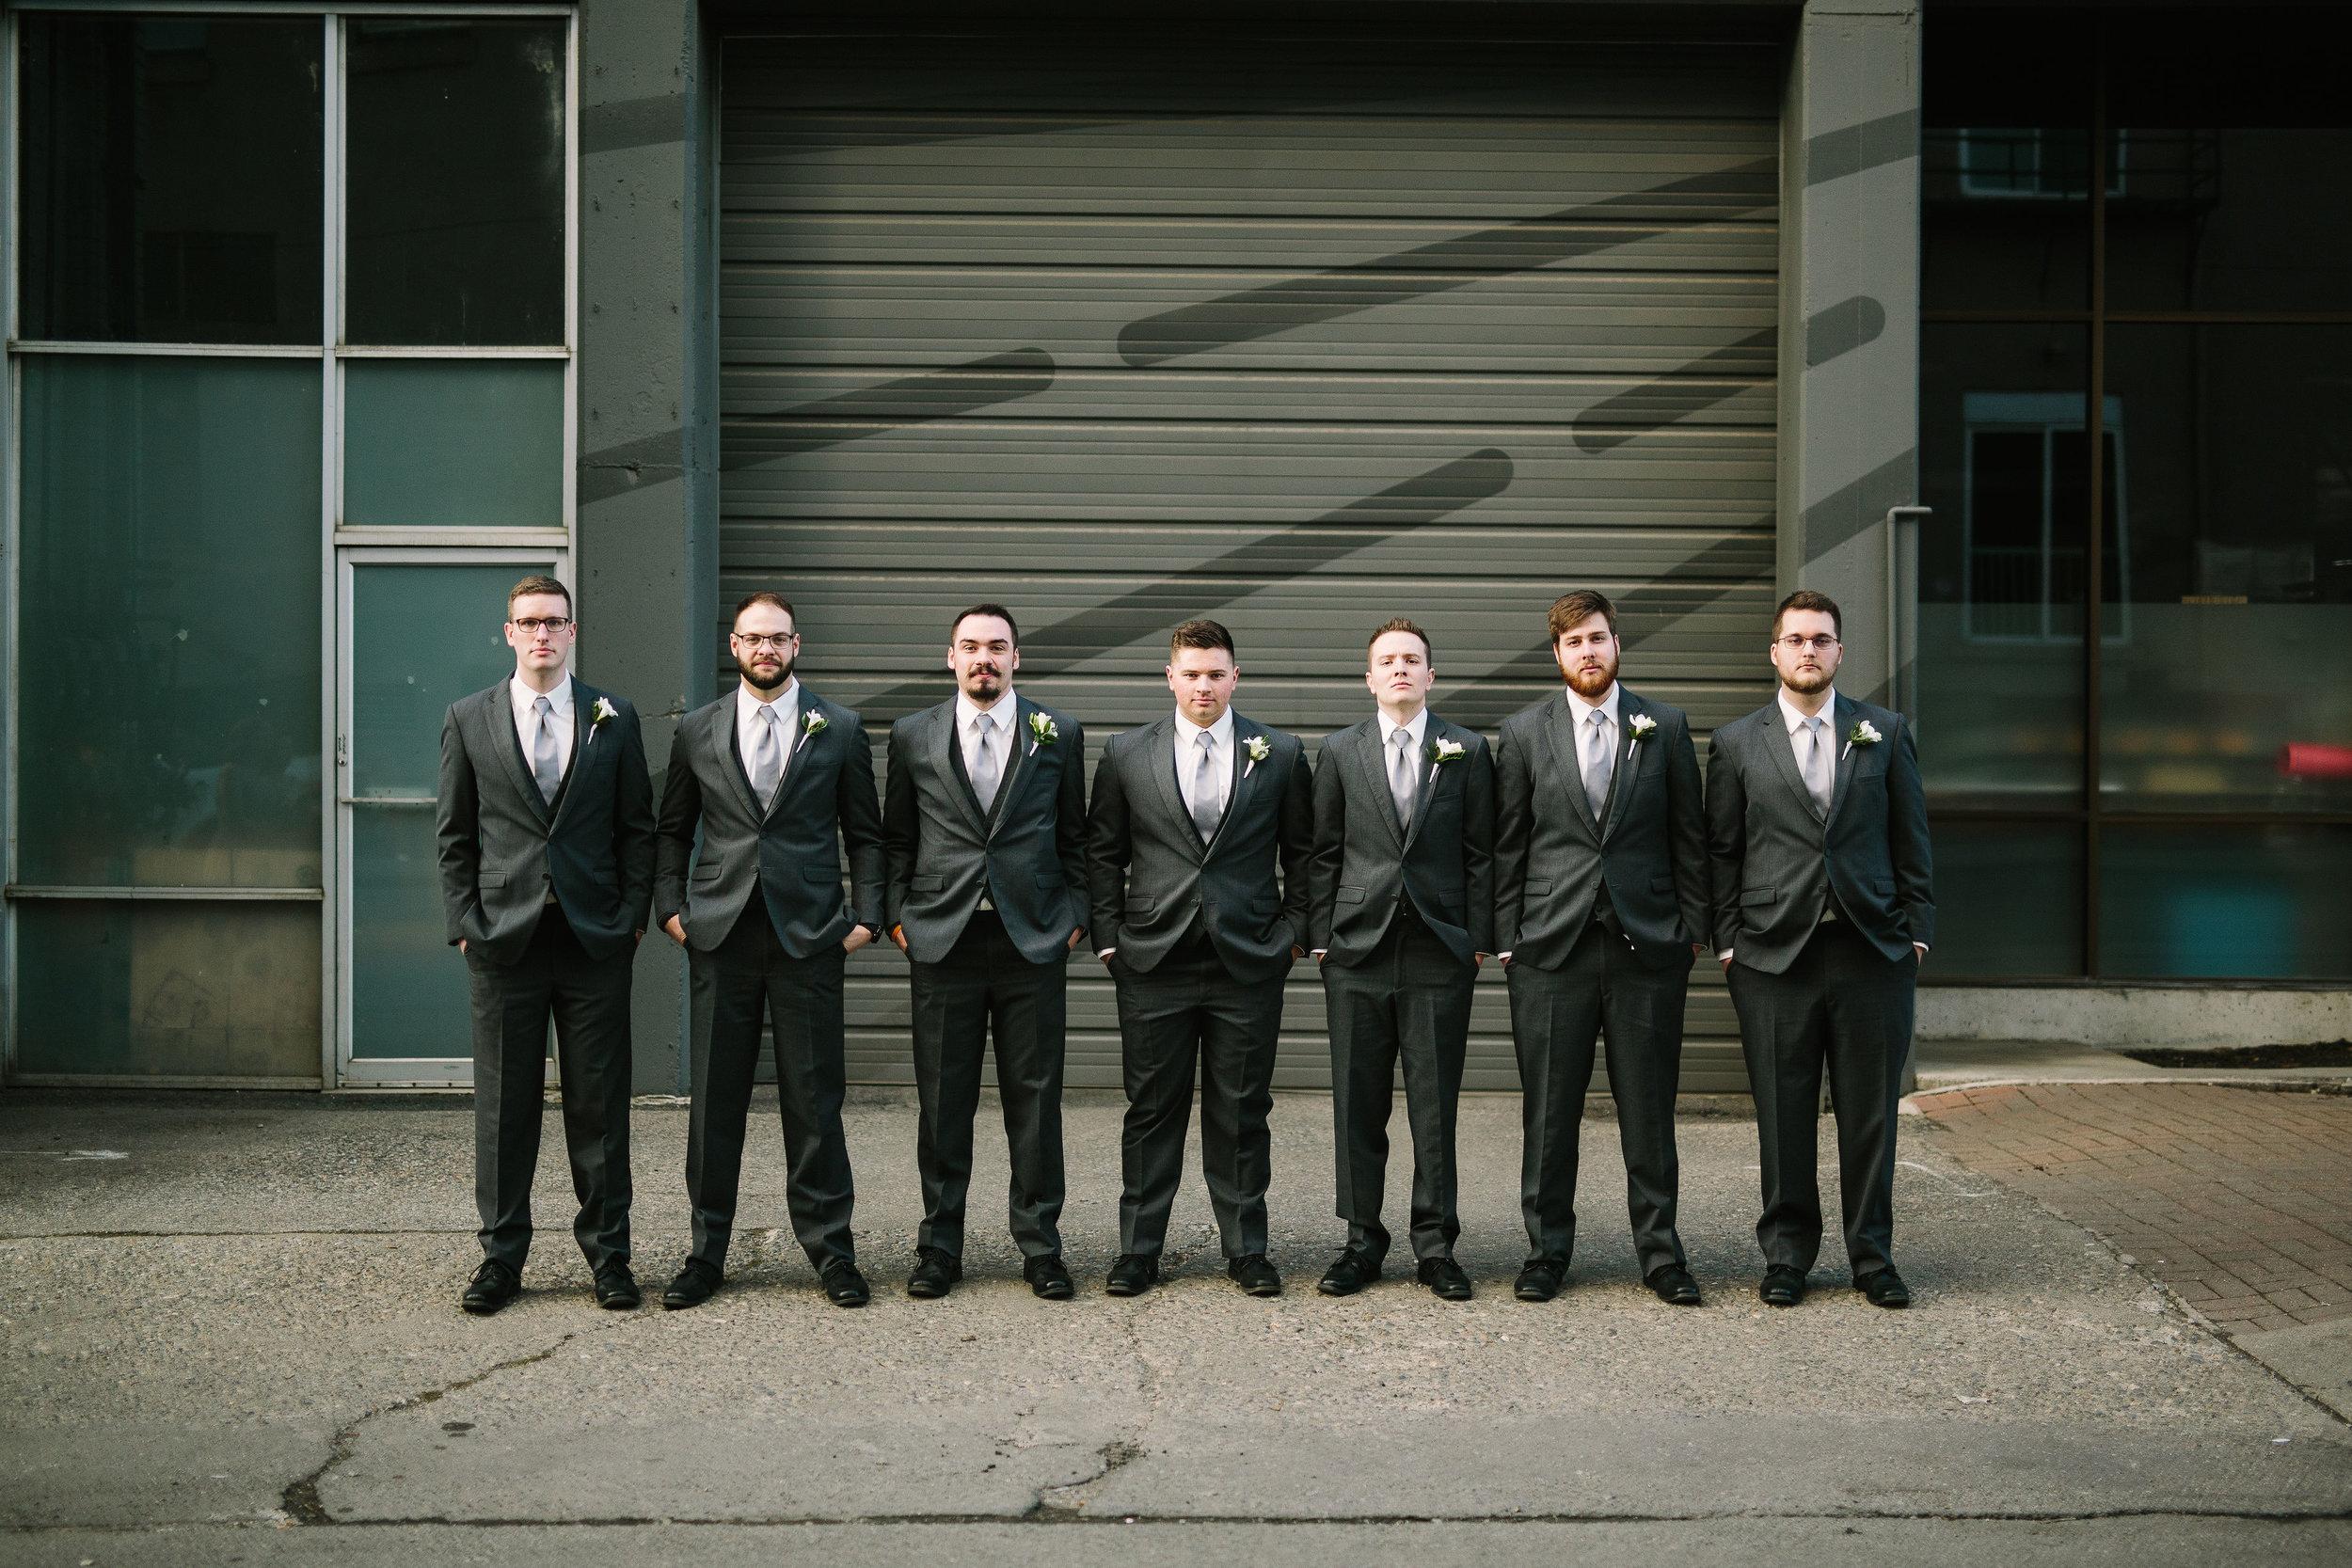 Fun Rustic spokane wedding groomsmen photo together standing side by side